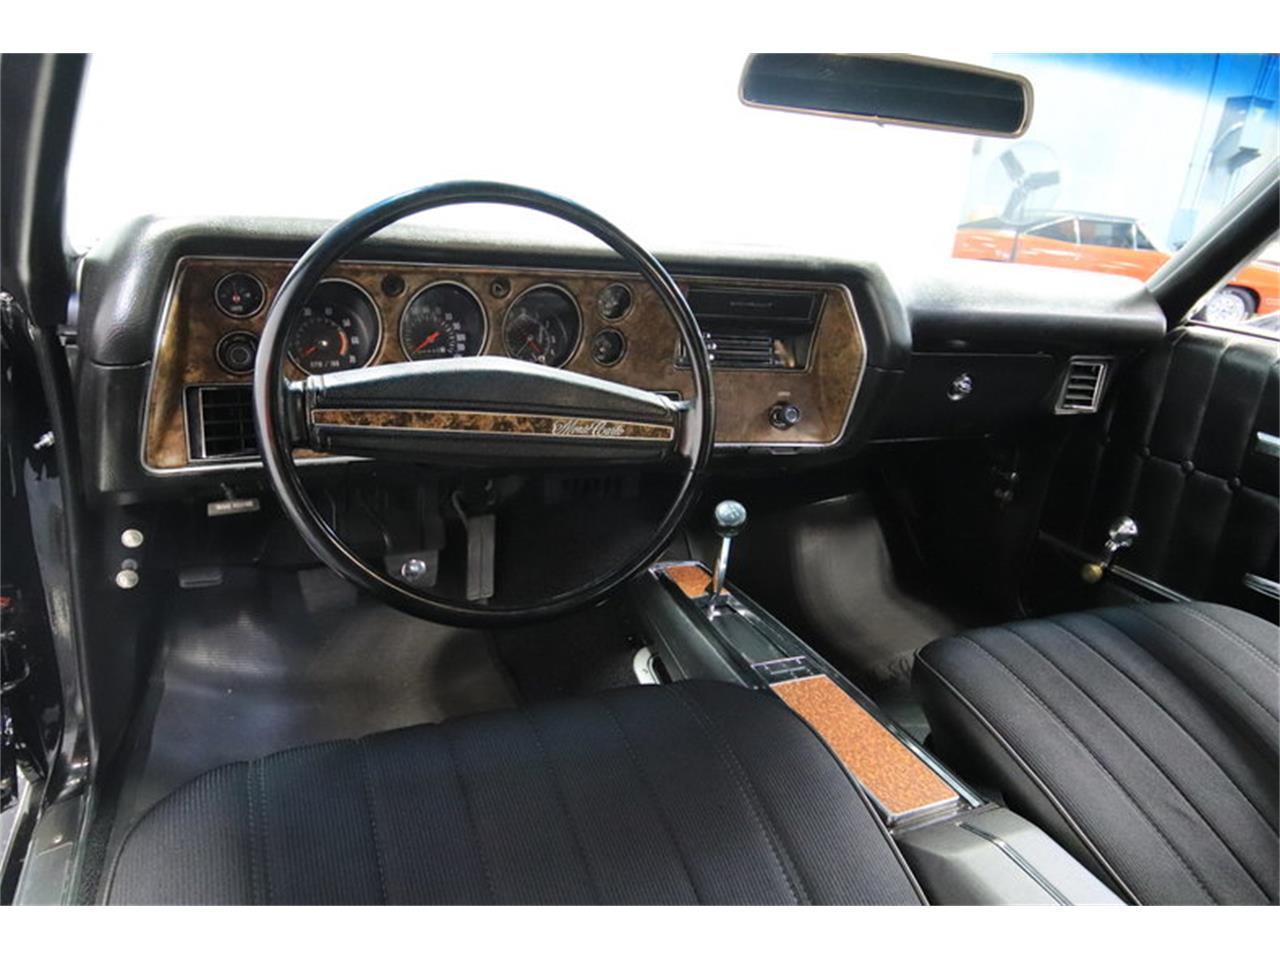 1971 Chevrolet Monte Carlo For Sale Classiccars Com Cc 1095728